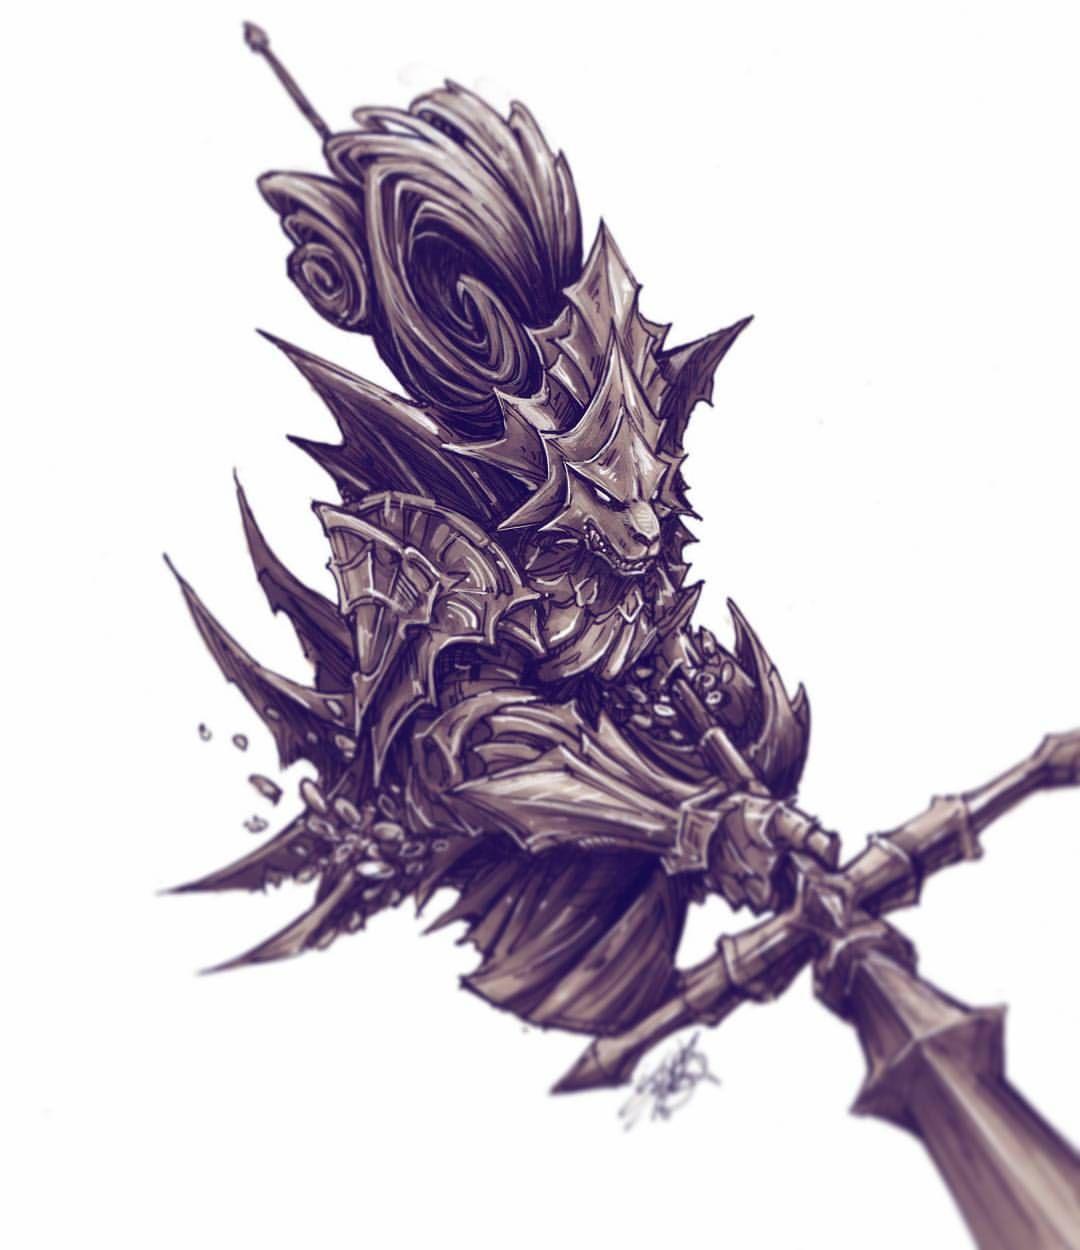 Dark souls 3, Art contests and Dark souls on Pinterest